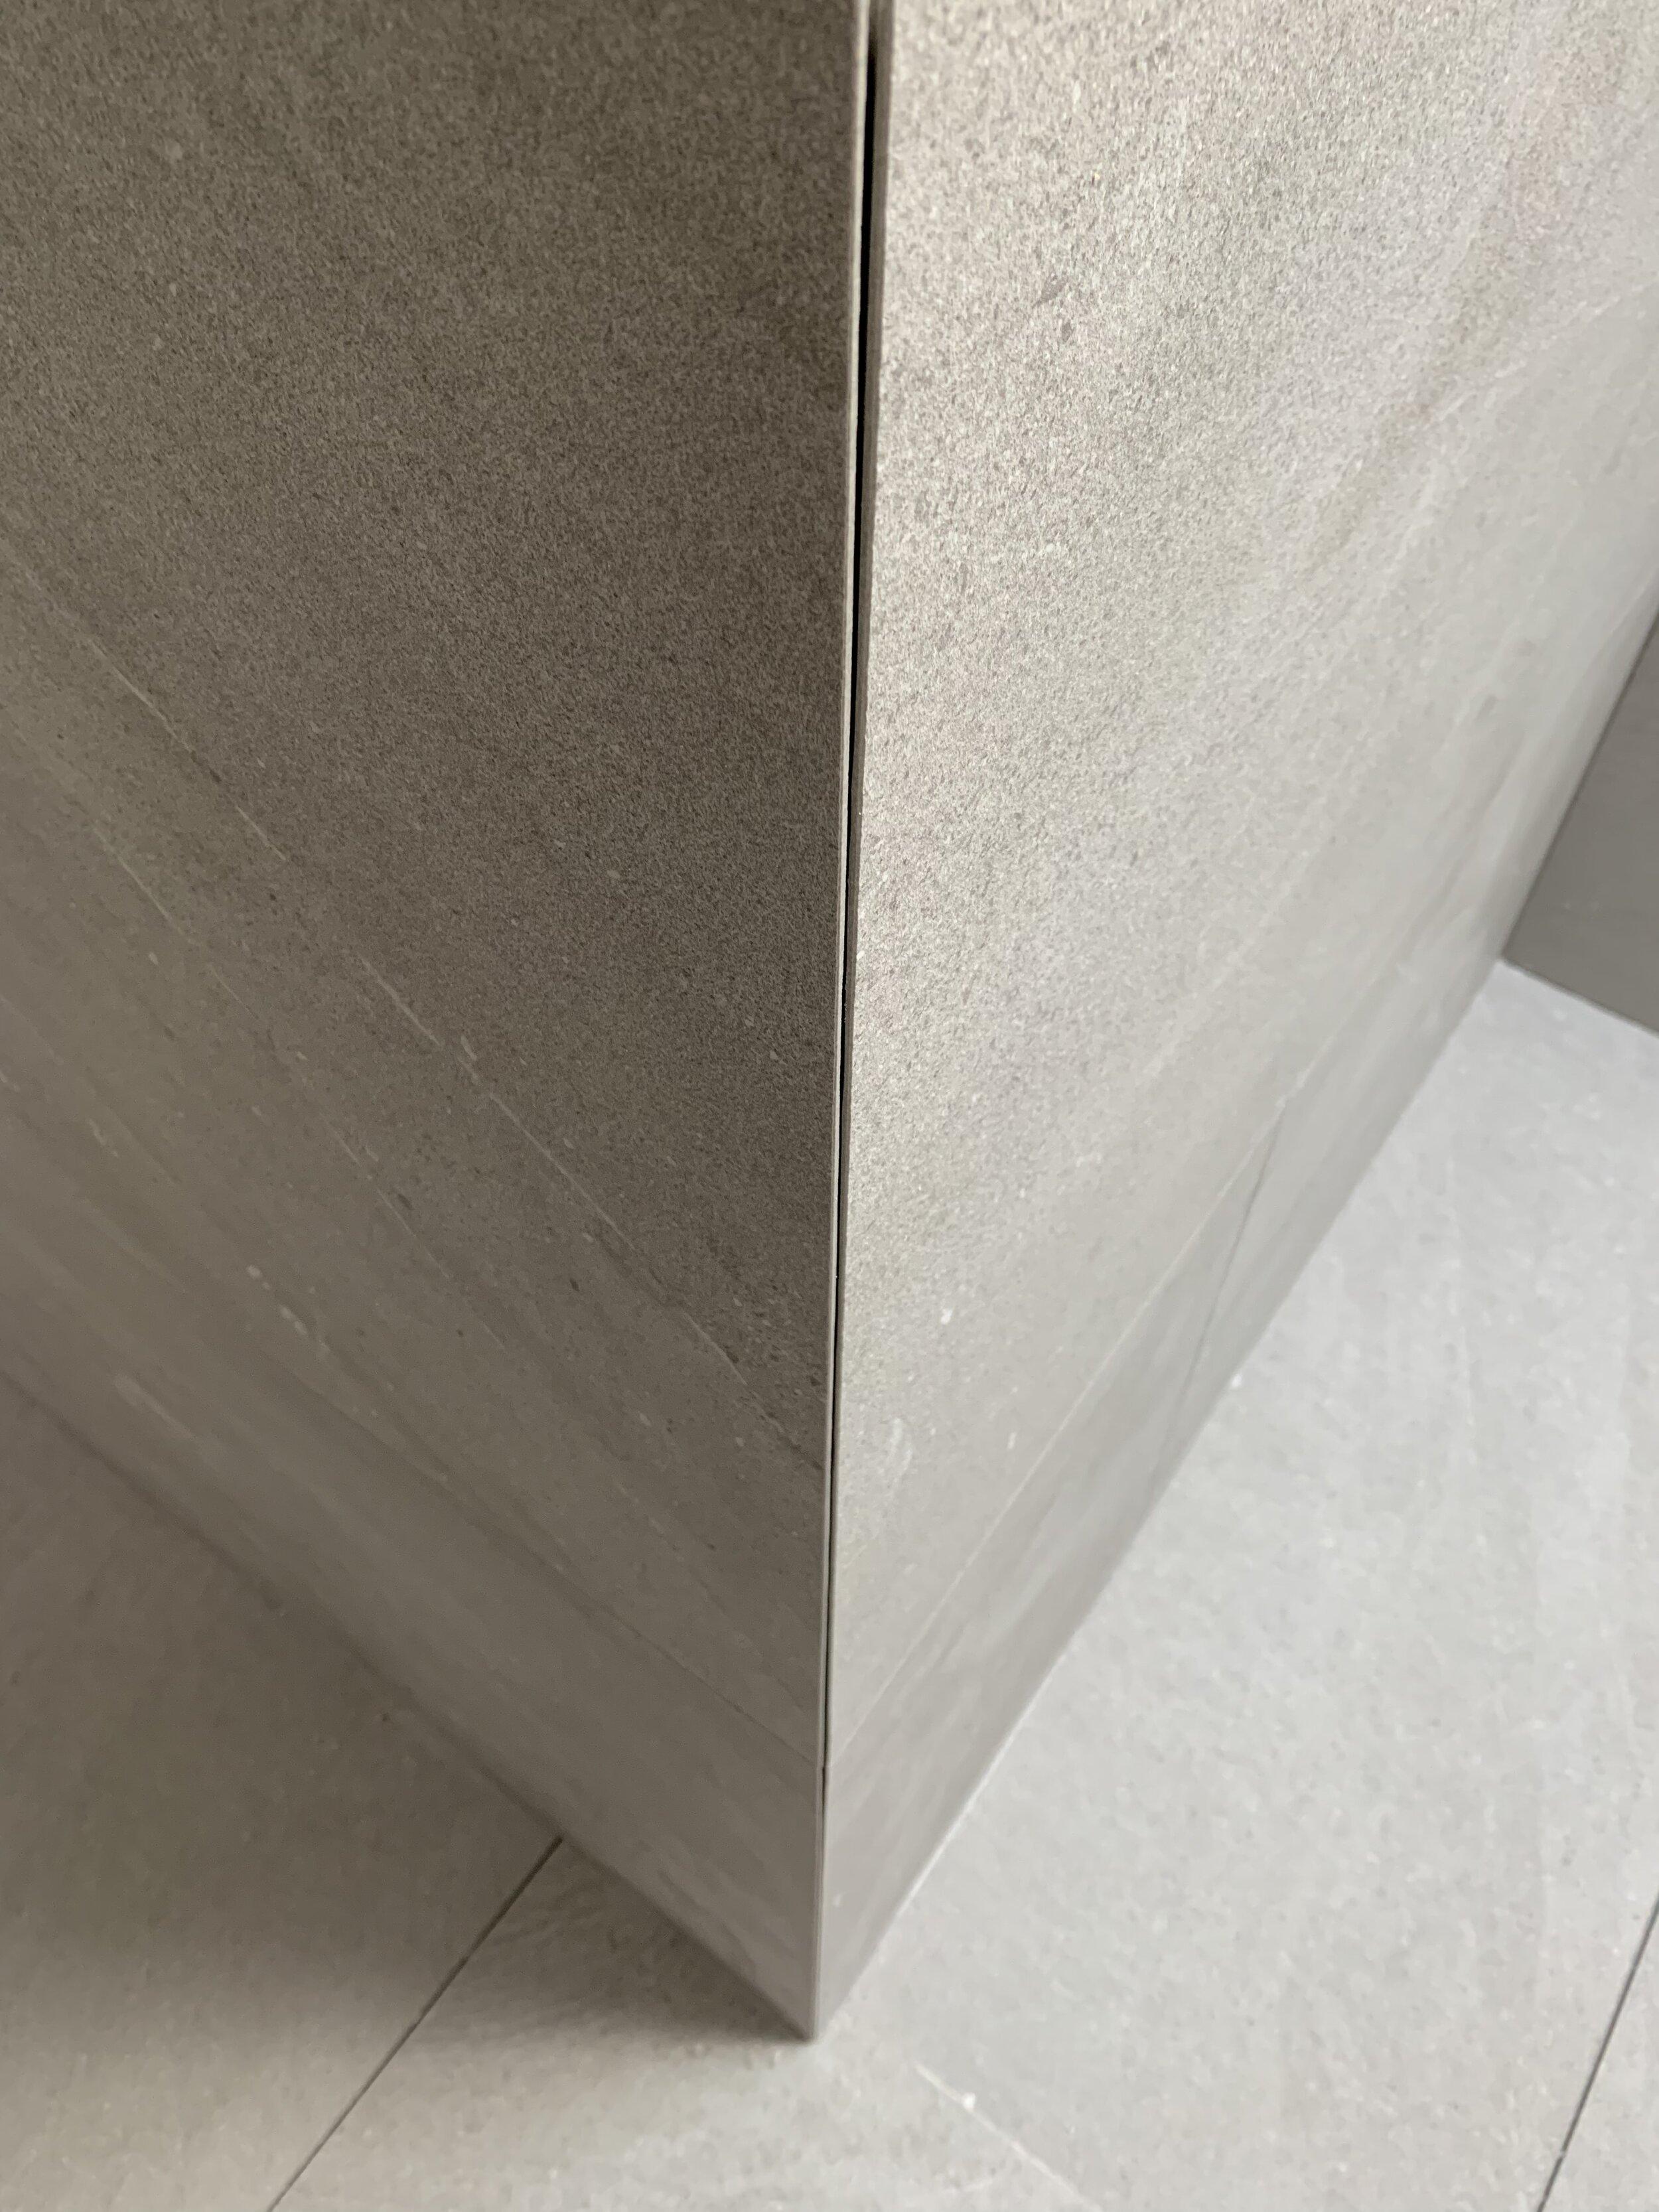 Zephyr and Stone • Resort Bathroom • Mitred Corner Pre-Silicone